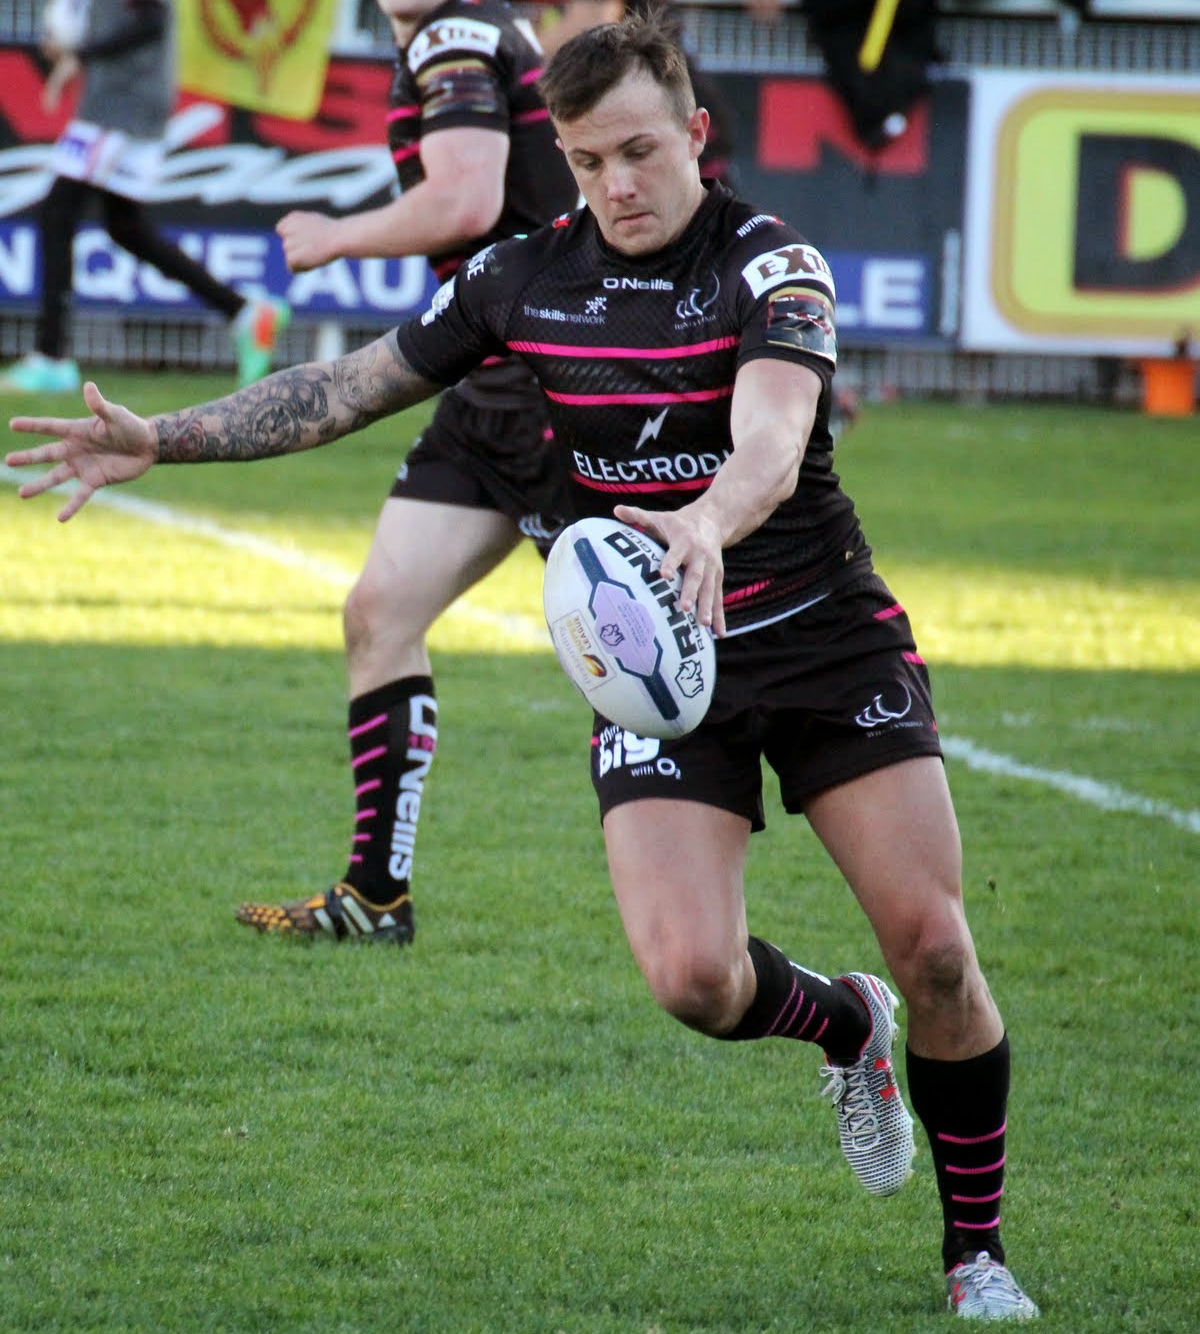 An Nrl Blog Nrl 2012: Danny Craven (rugby League)